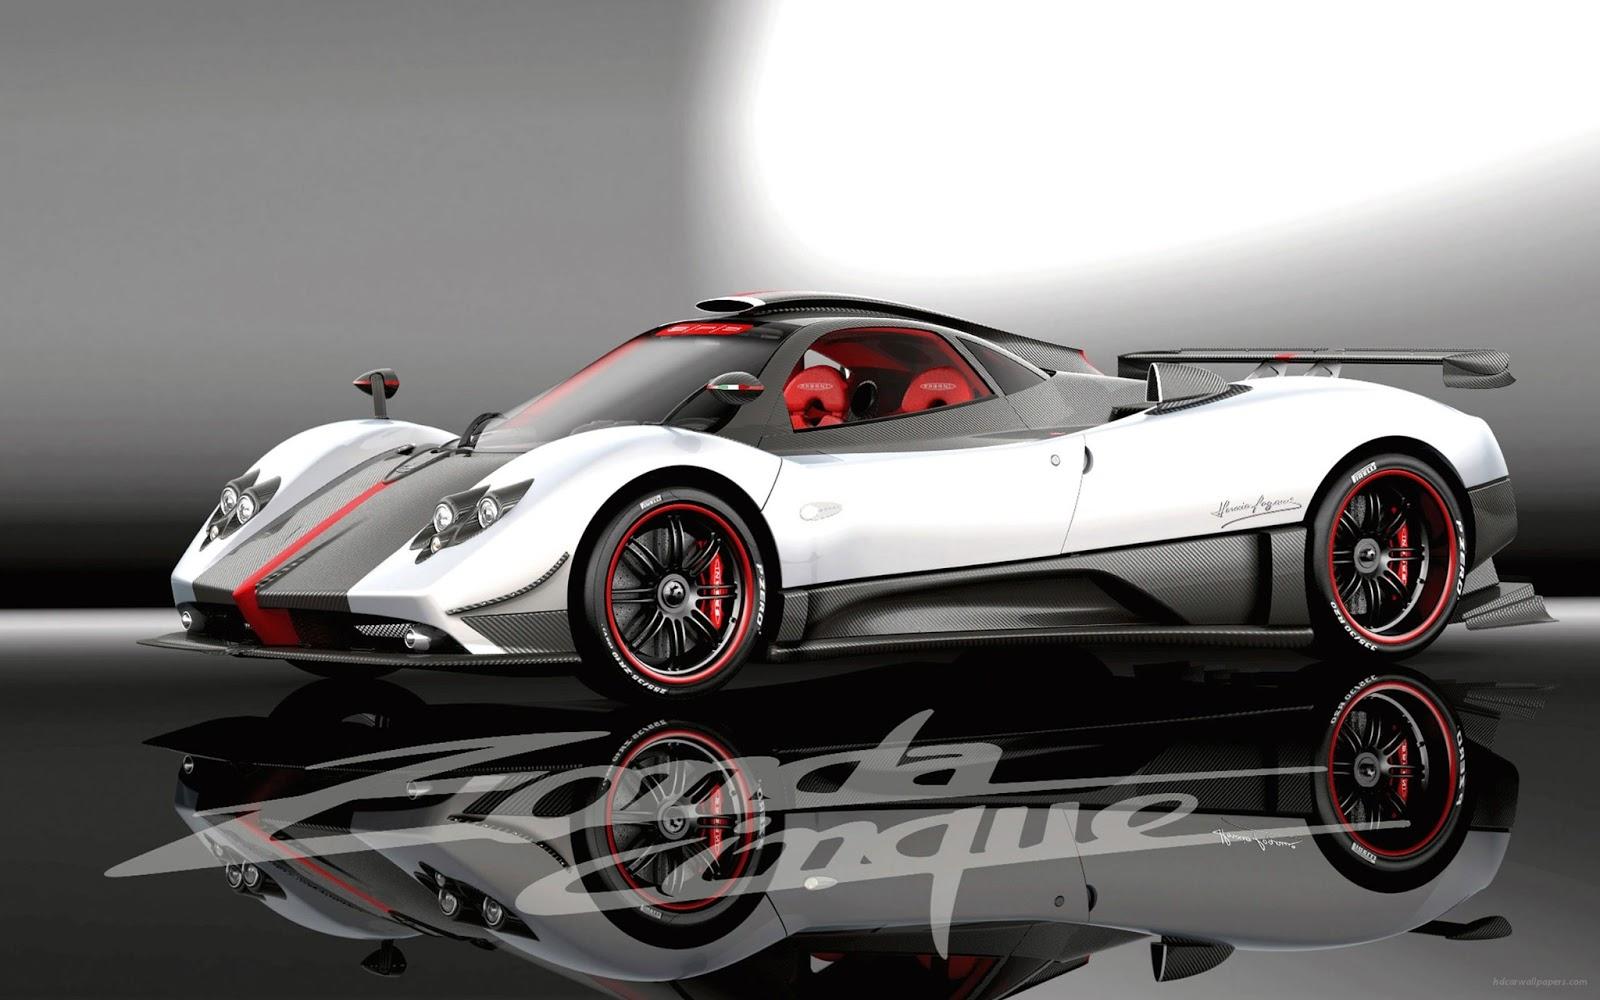 Pagani Zonda 2013 New Revolution Car Hd Desktop Wallpapers Download